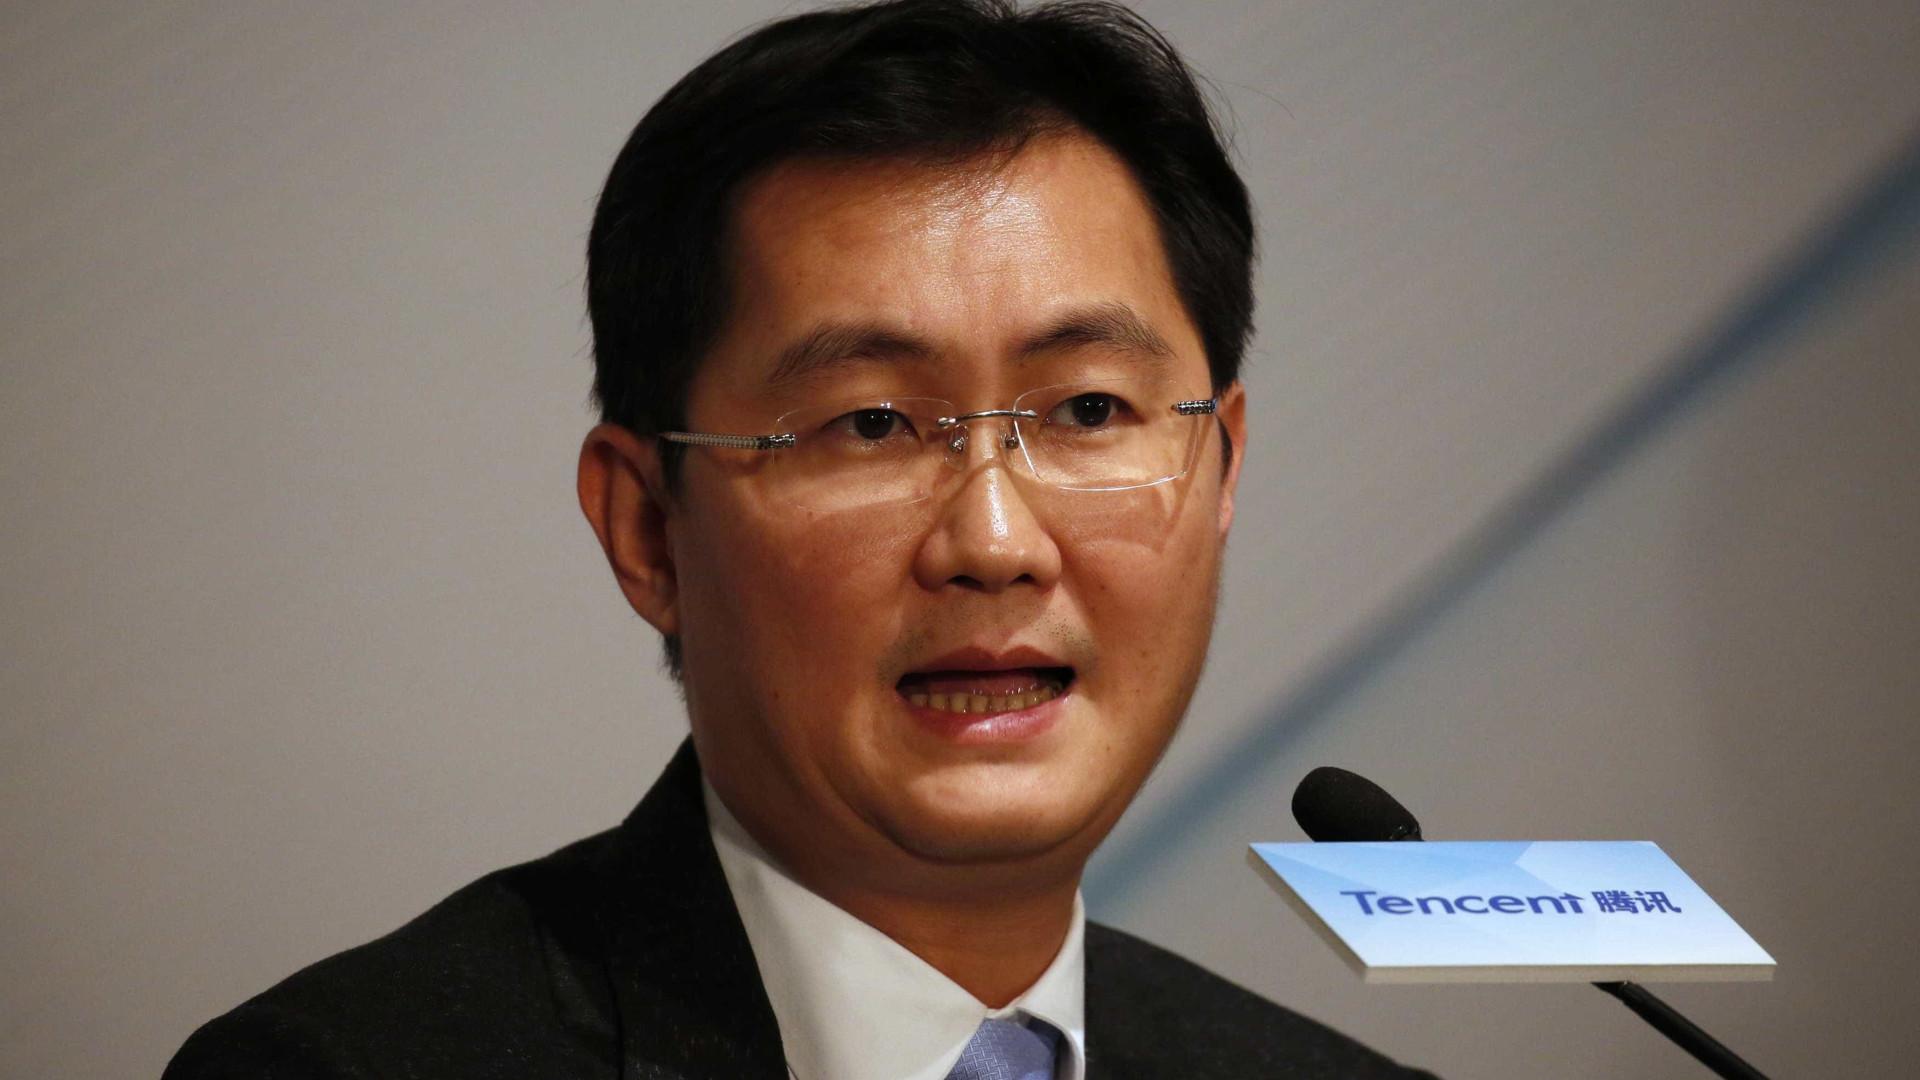 Tencent, gigante de tecnologia chinesa, ultrapassa Facebook em valor de mercado